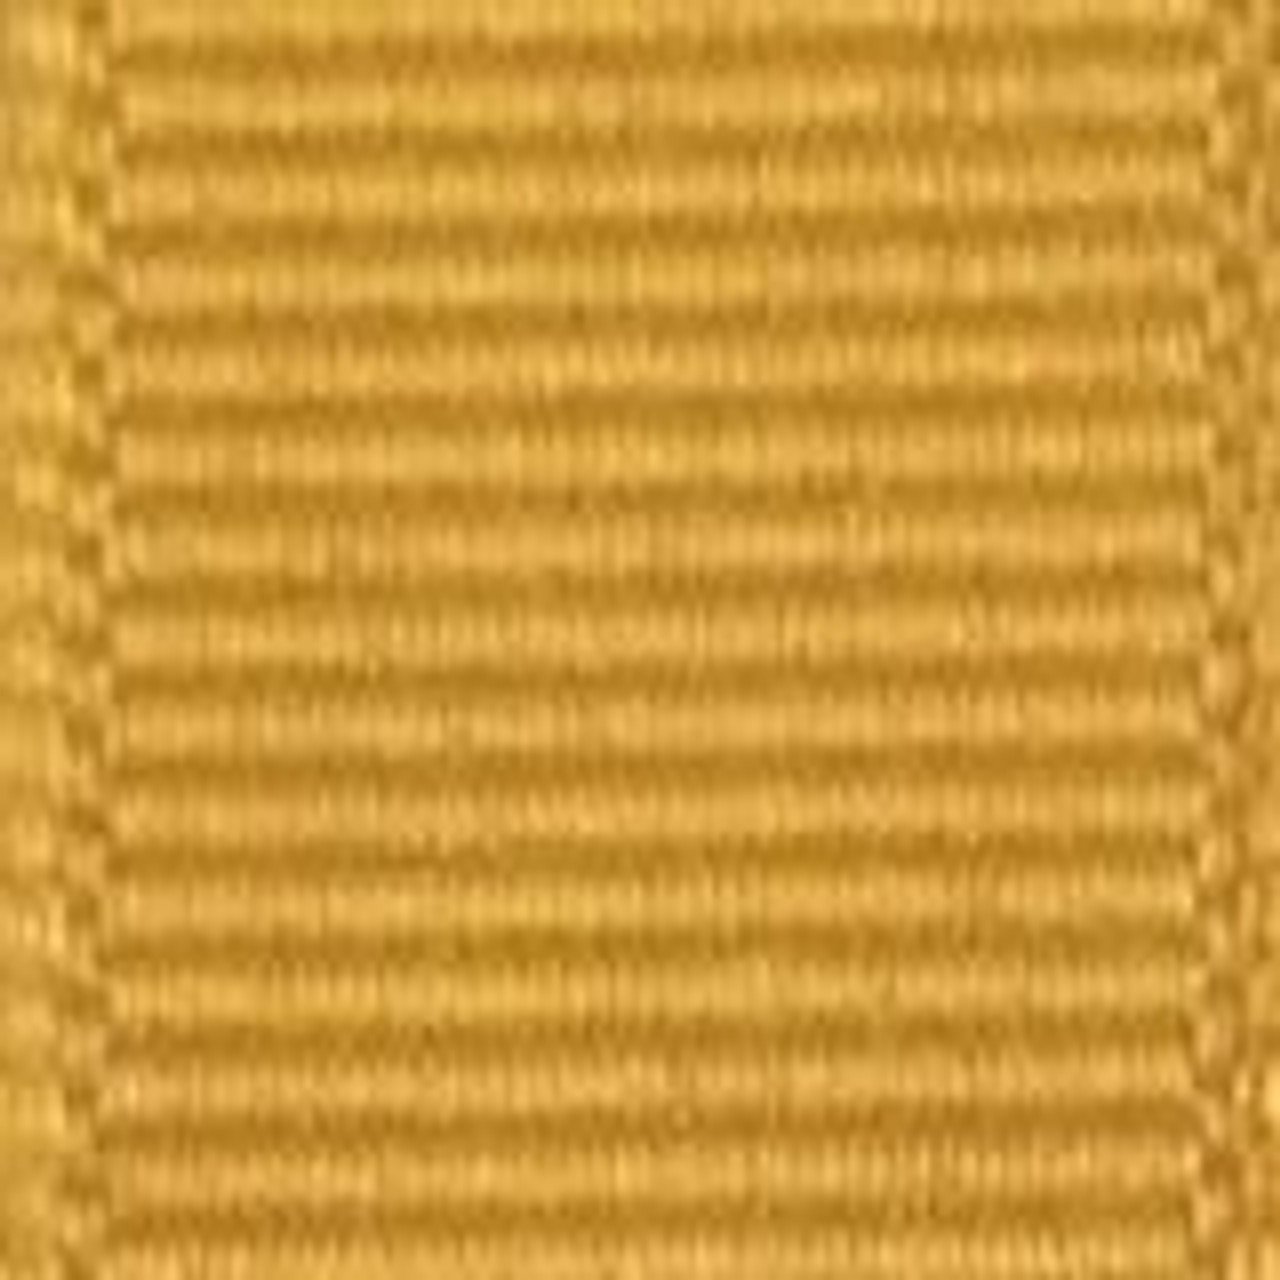 Gold Offray Grosgrain Ribbon